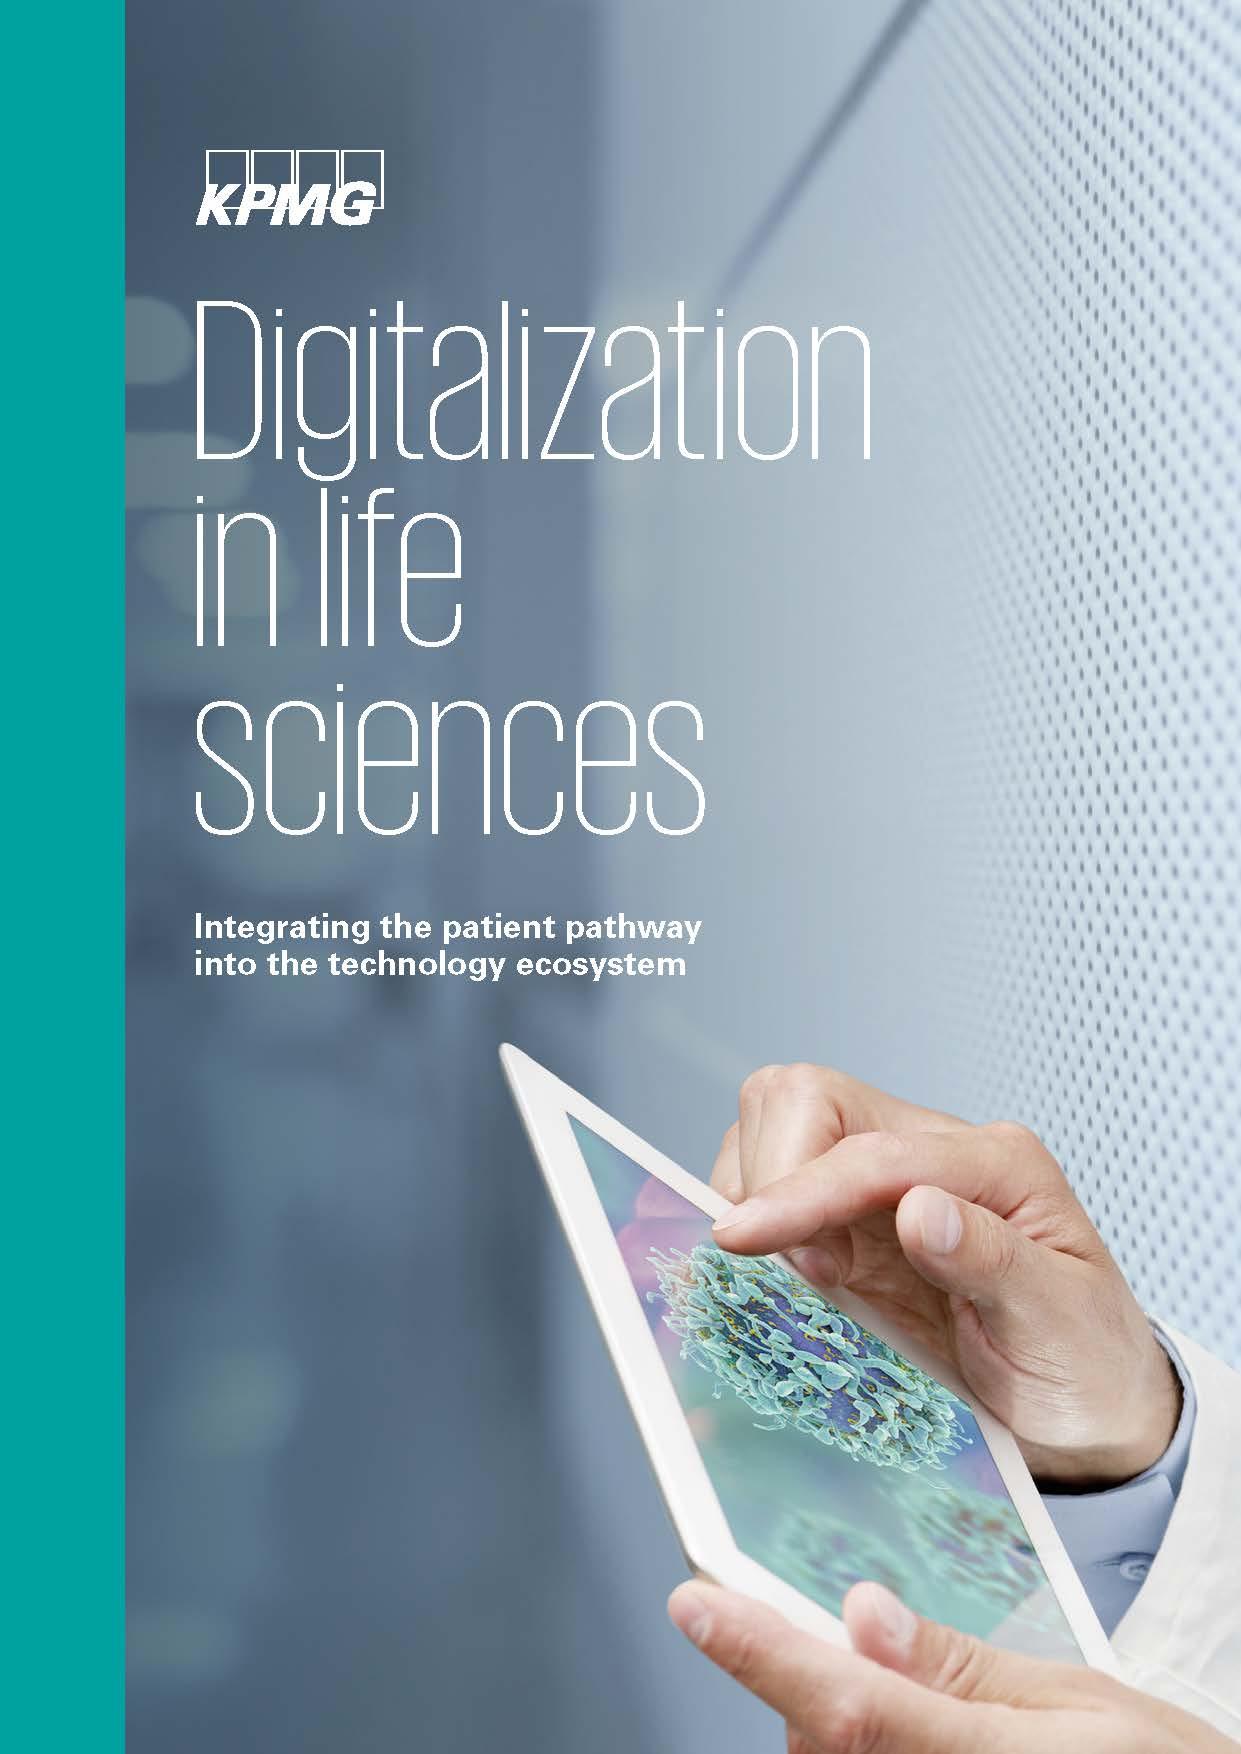 14845_Studie_KPMG_Digitalization life sciences_BF_sec_Seite_01.jpg